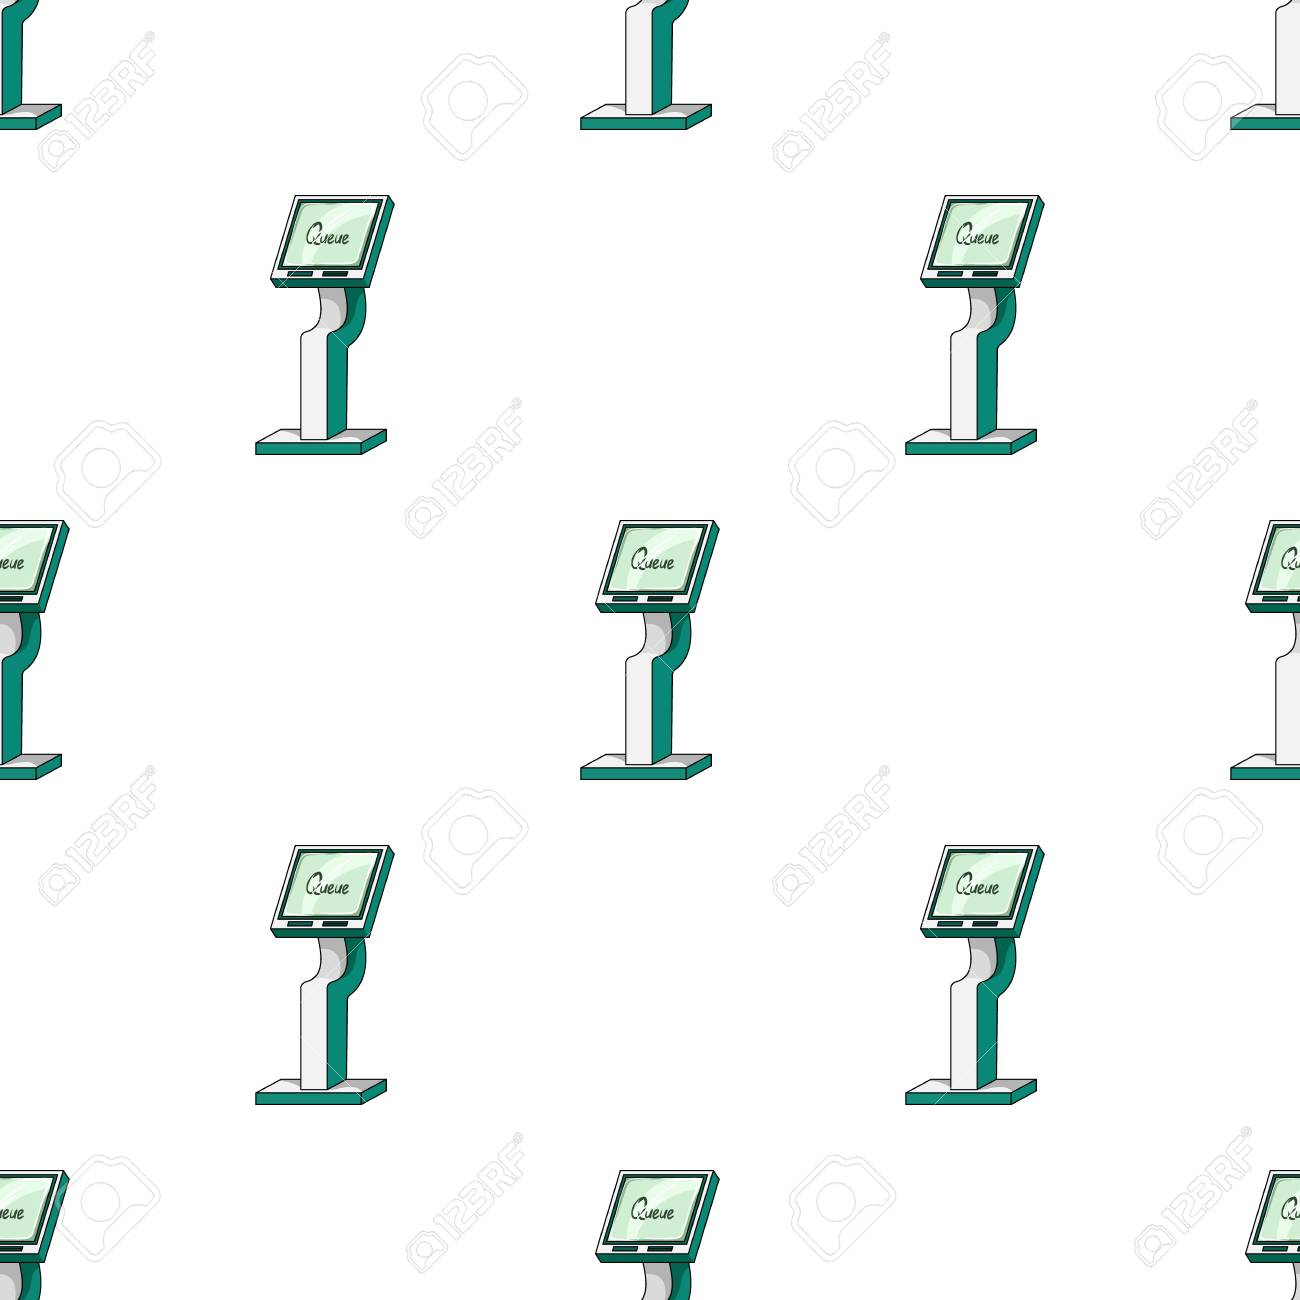 Queue access terminal terminals single icon in cartoon style queue access terminal terminals single icon in cartoon style isometric vector symbol stock illustration ccuart Images